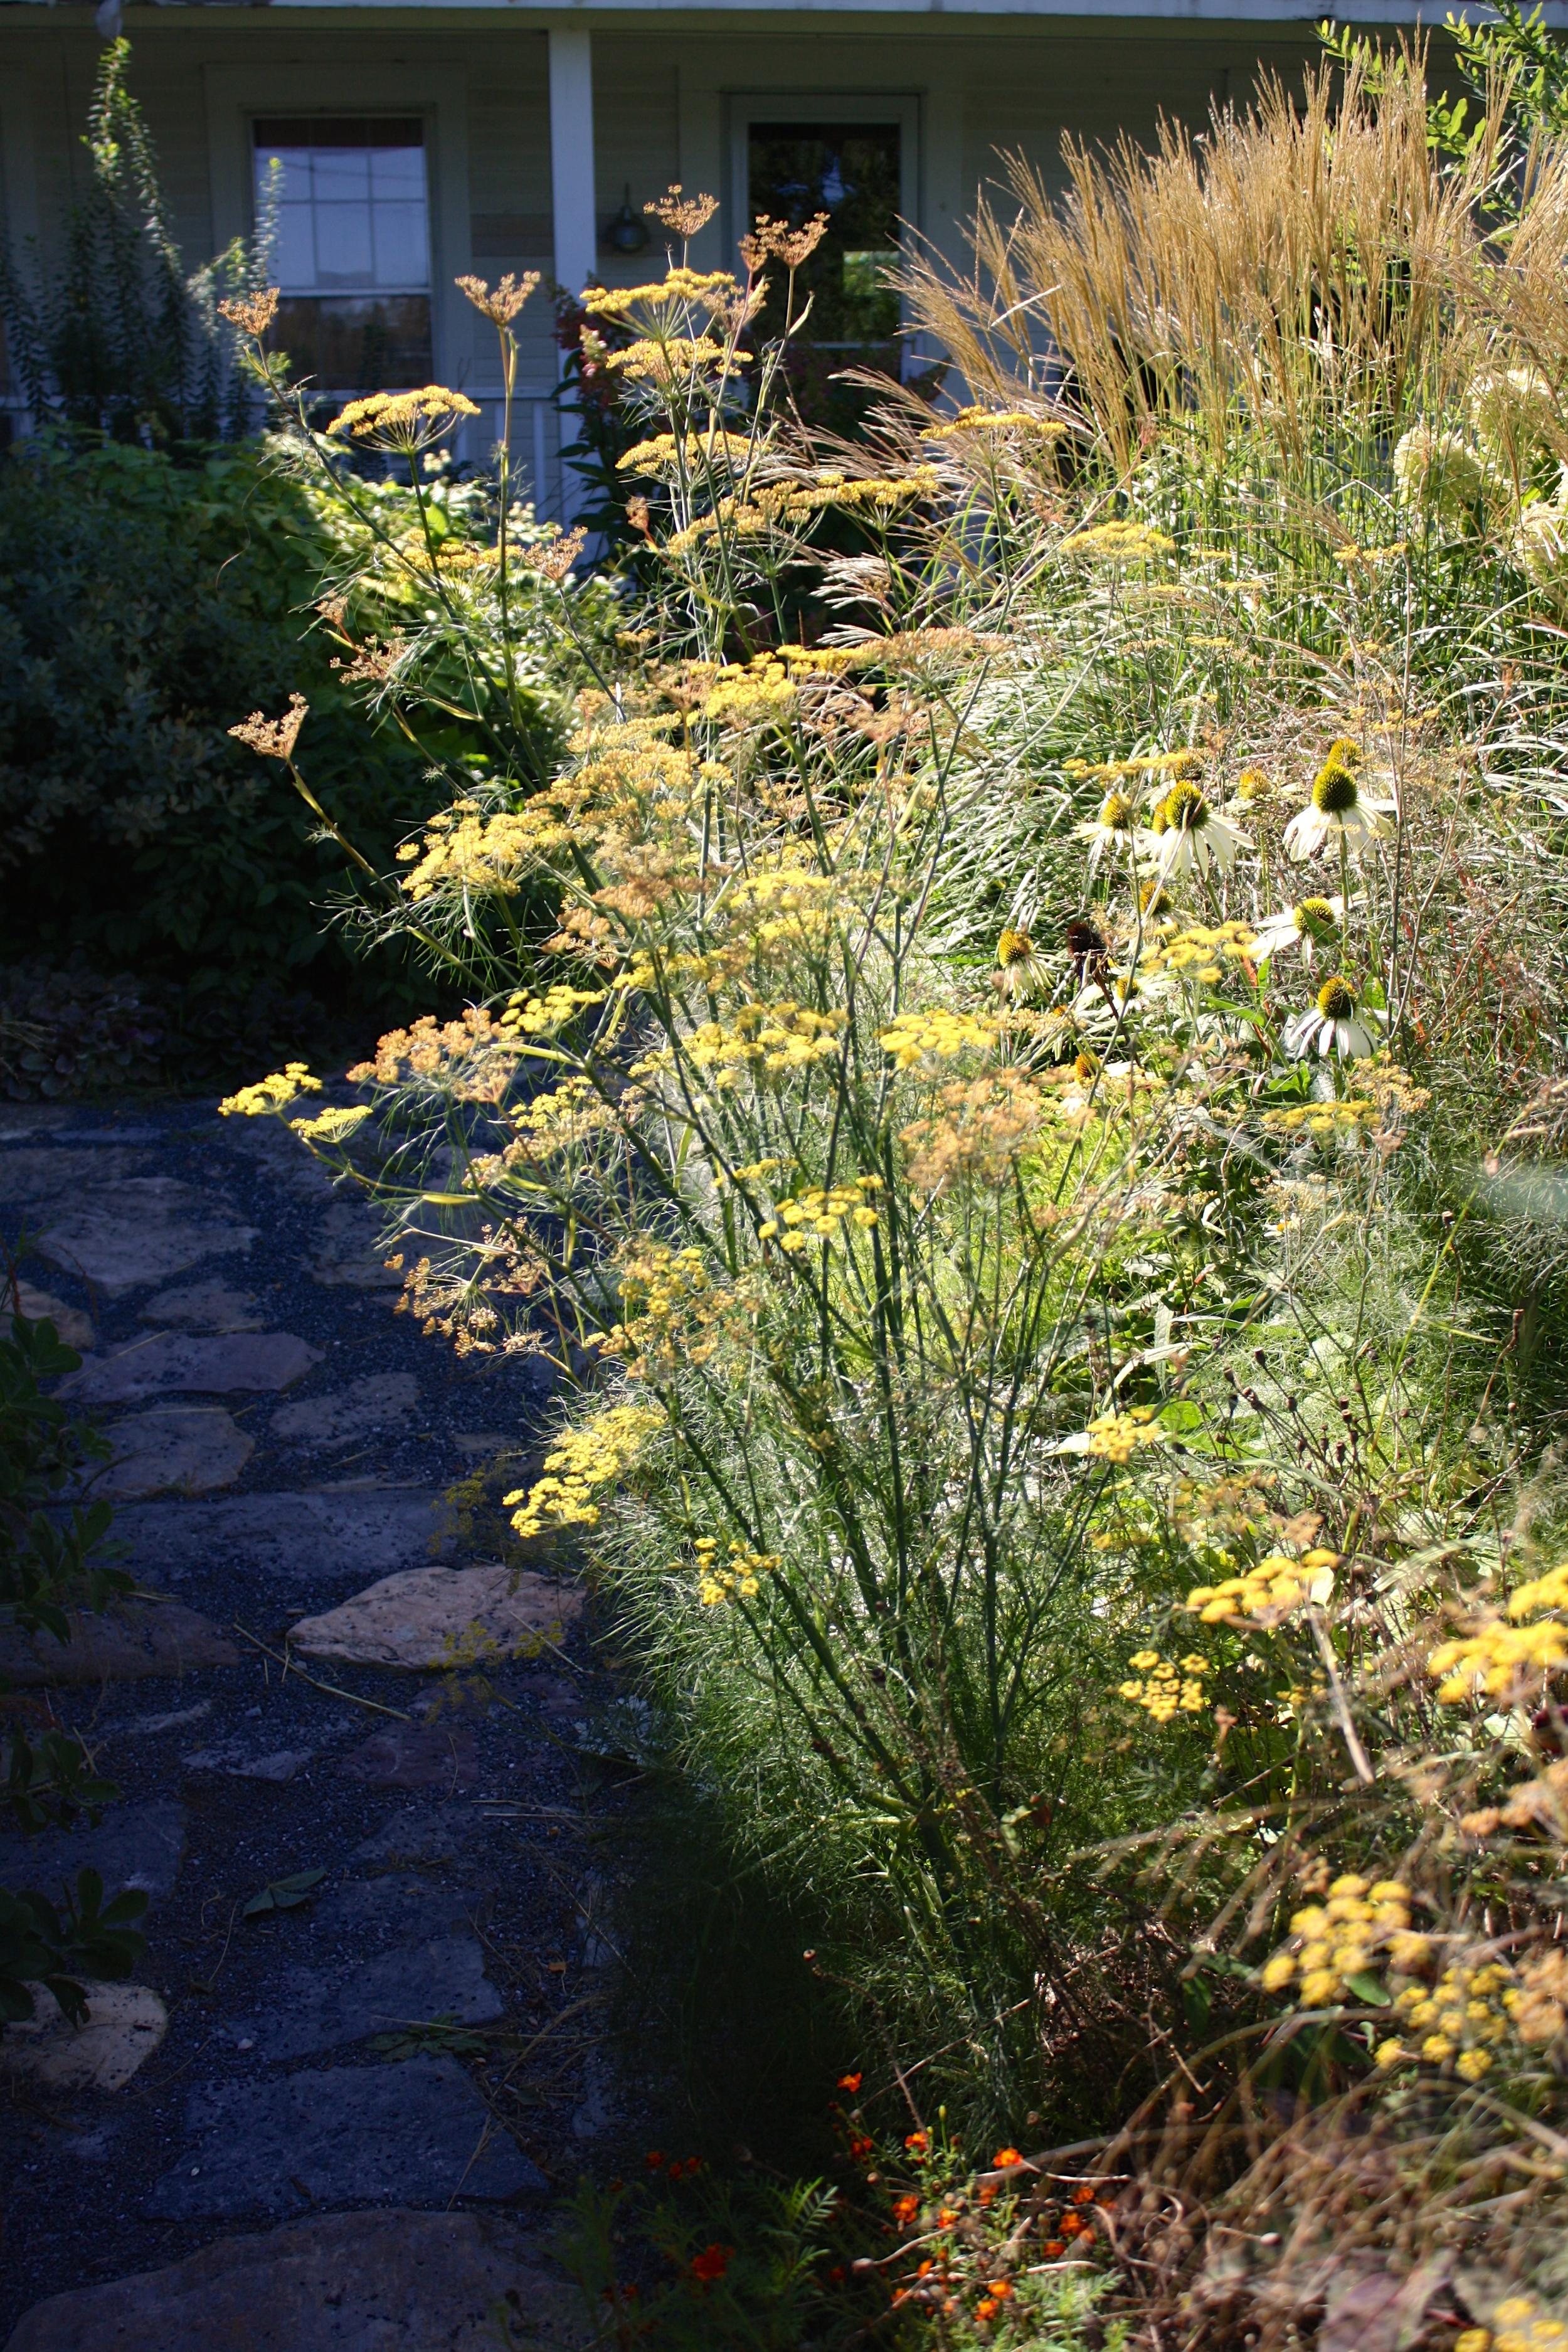 Bronze fennel, Miscanthus 'Adagio' blooming late summer